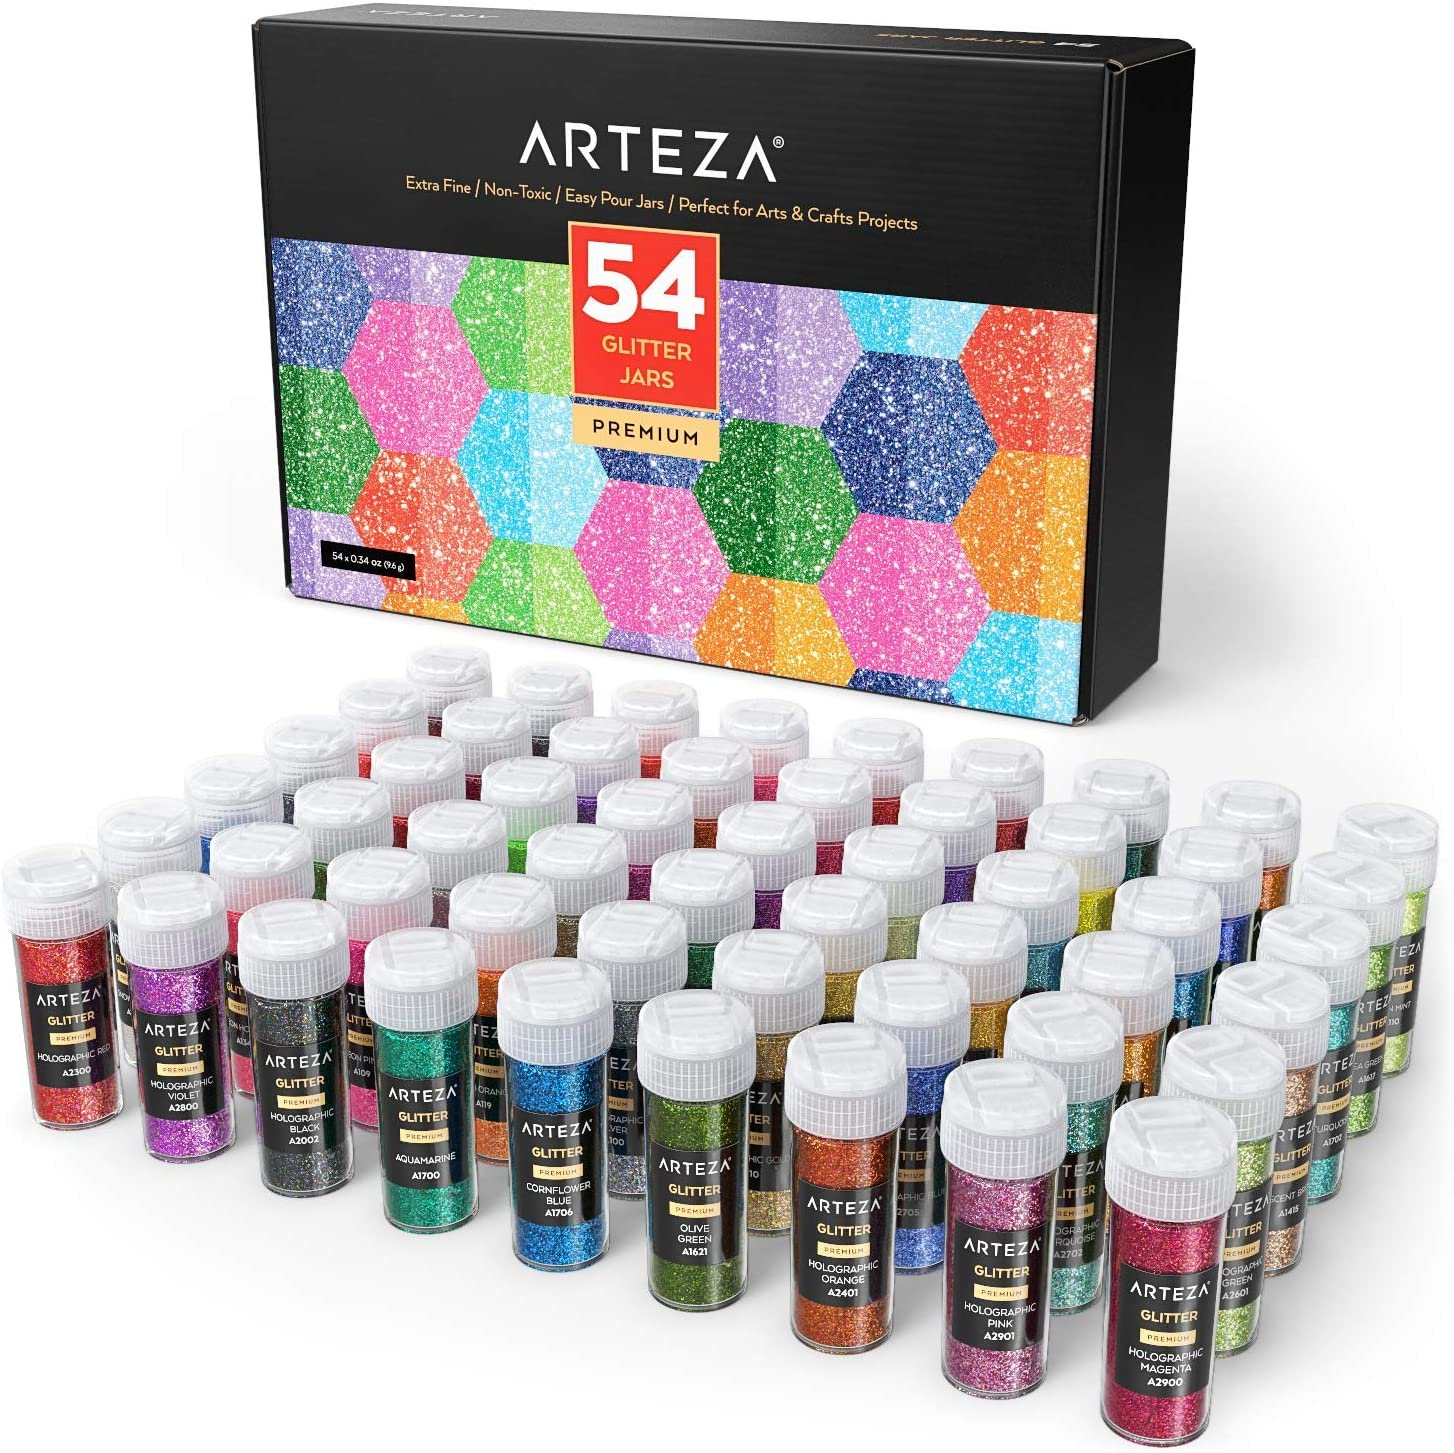 ARTEZA Fine Glitter, Set of 54 Colors, Shaker Jars (0.34oz/9.6 g) Glow Under UV Black Light, Extra Fine, All Purpose for Body, Face, Slime, Crafts